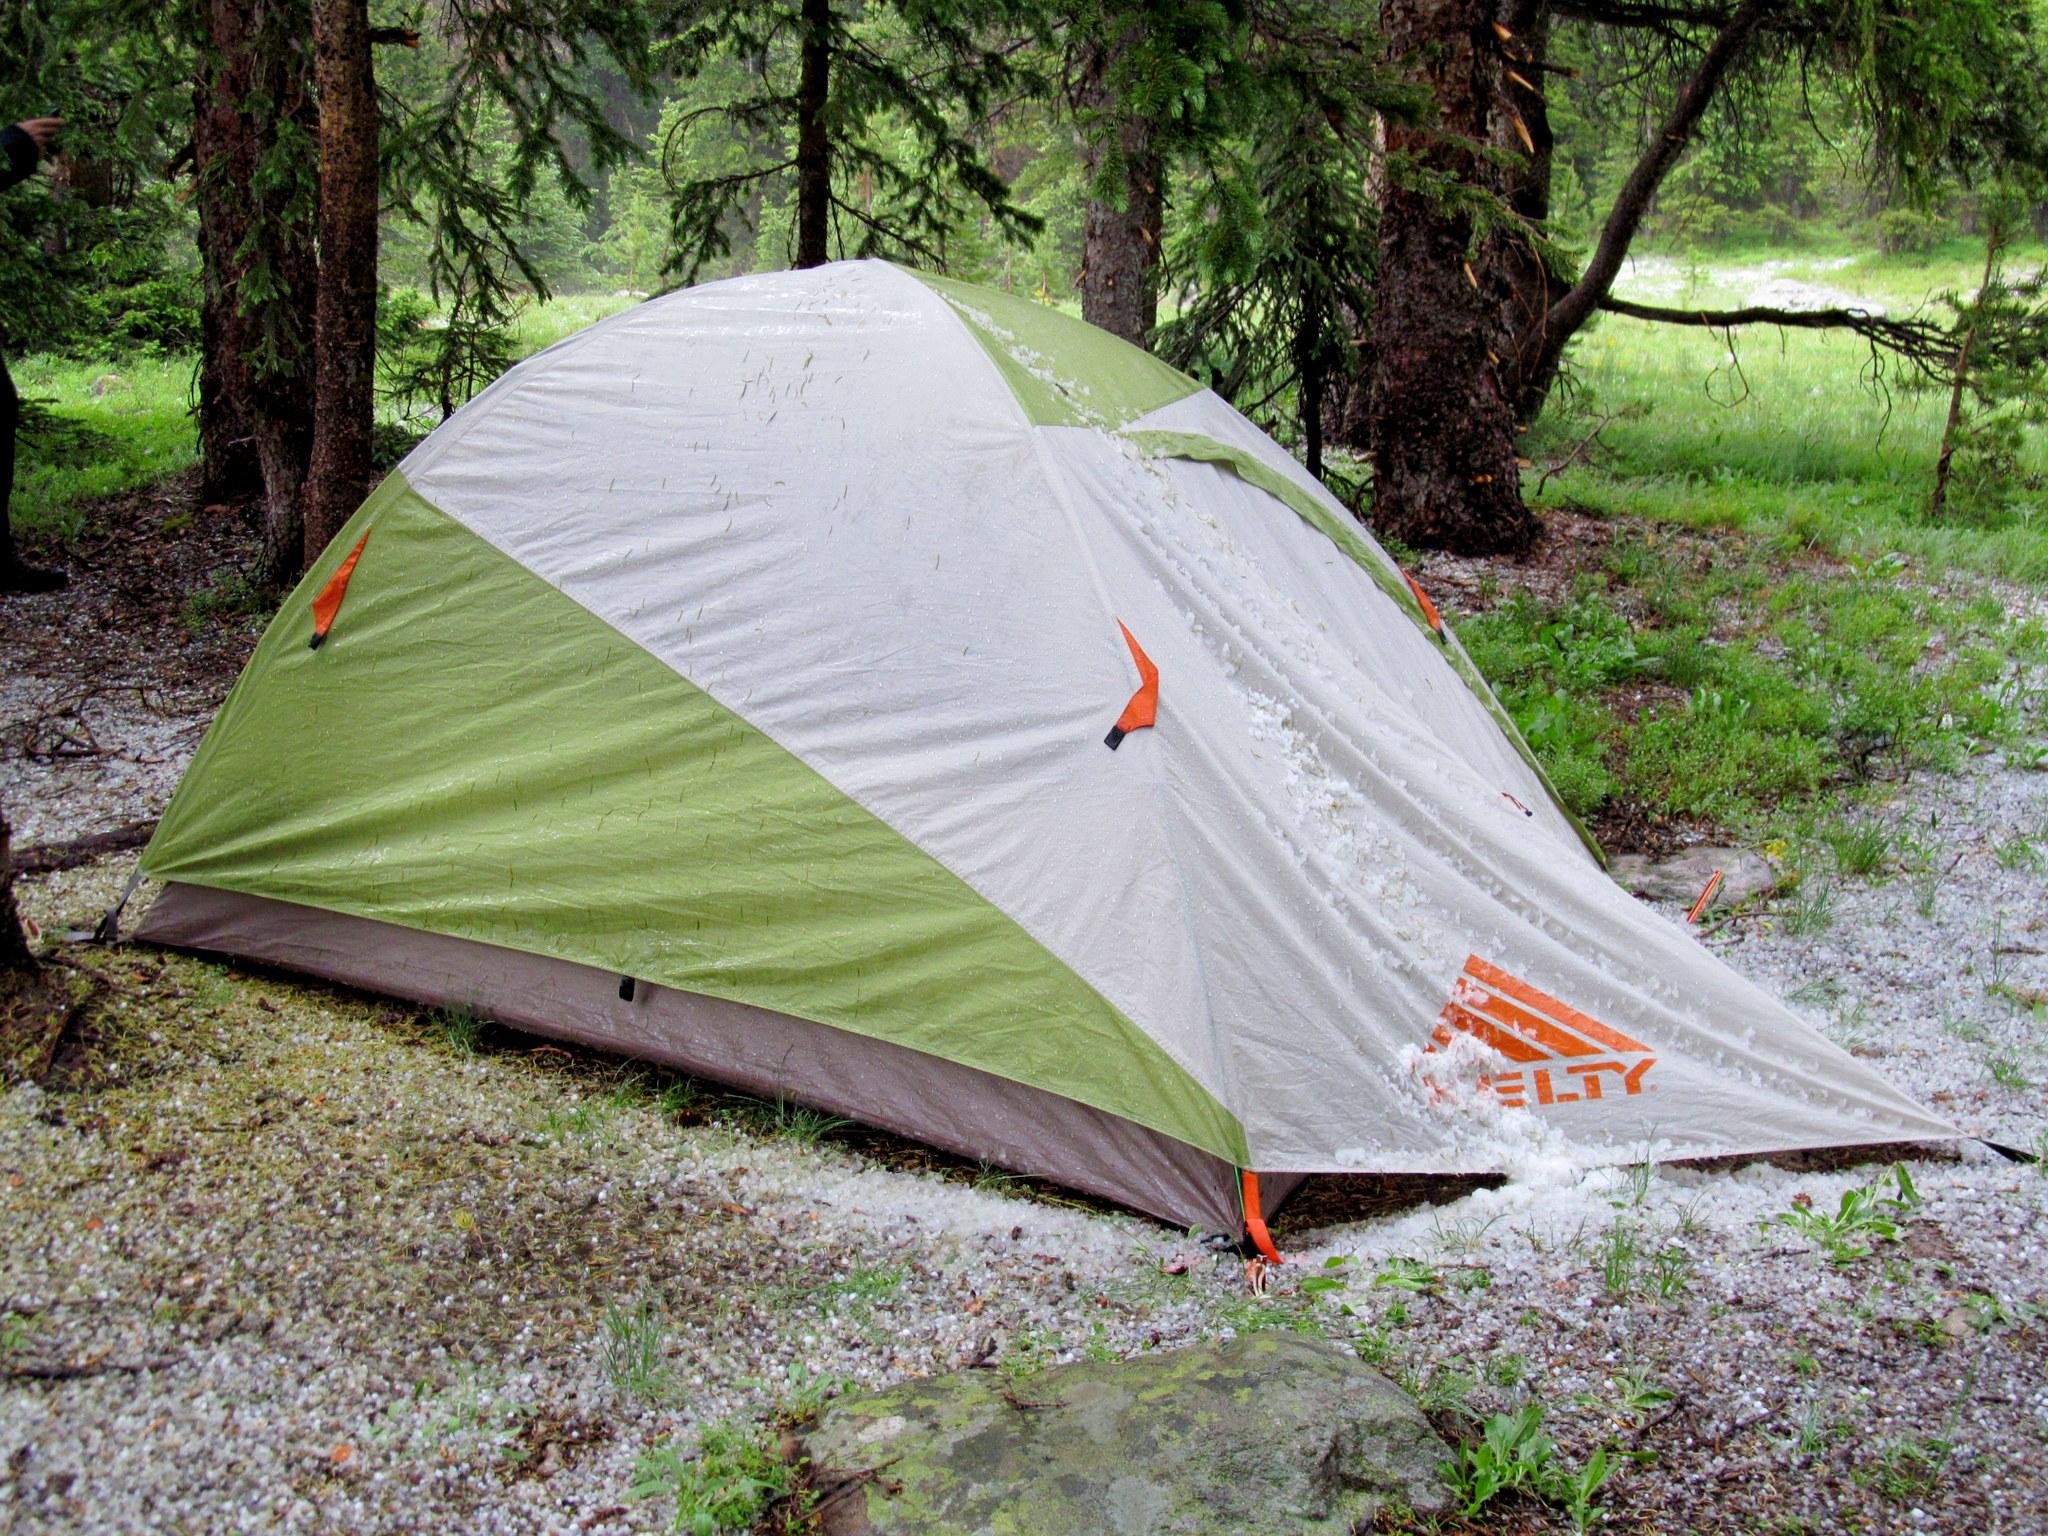 Photo: Hail on my tent